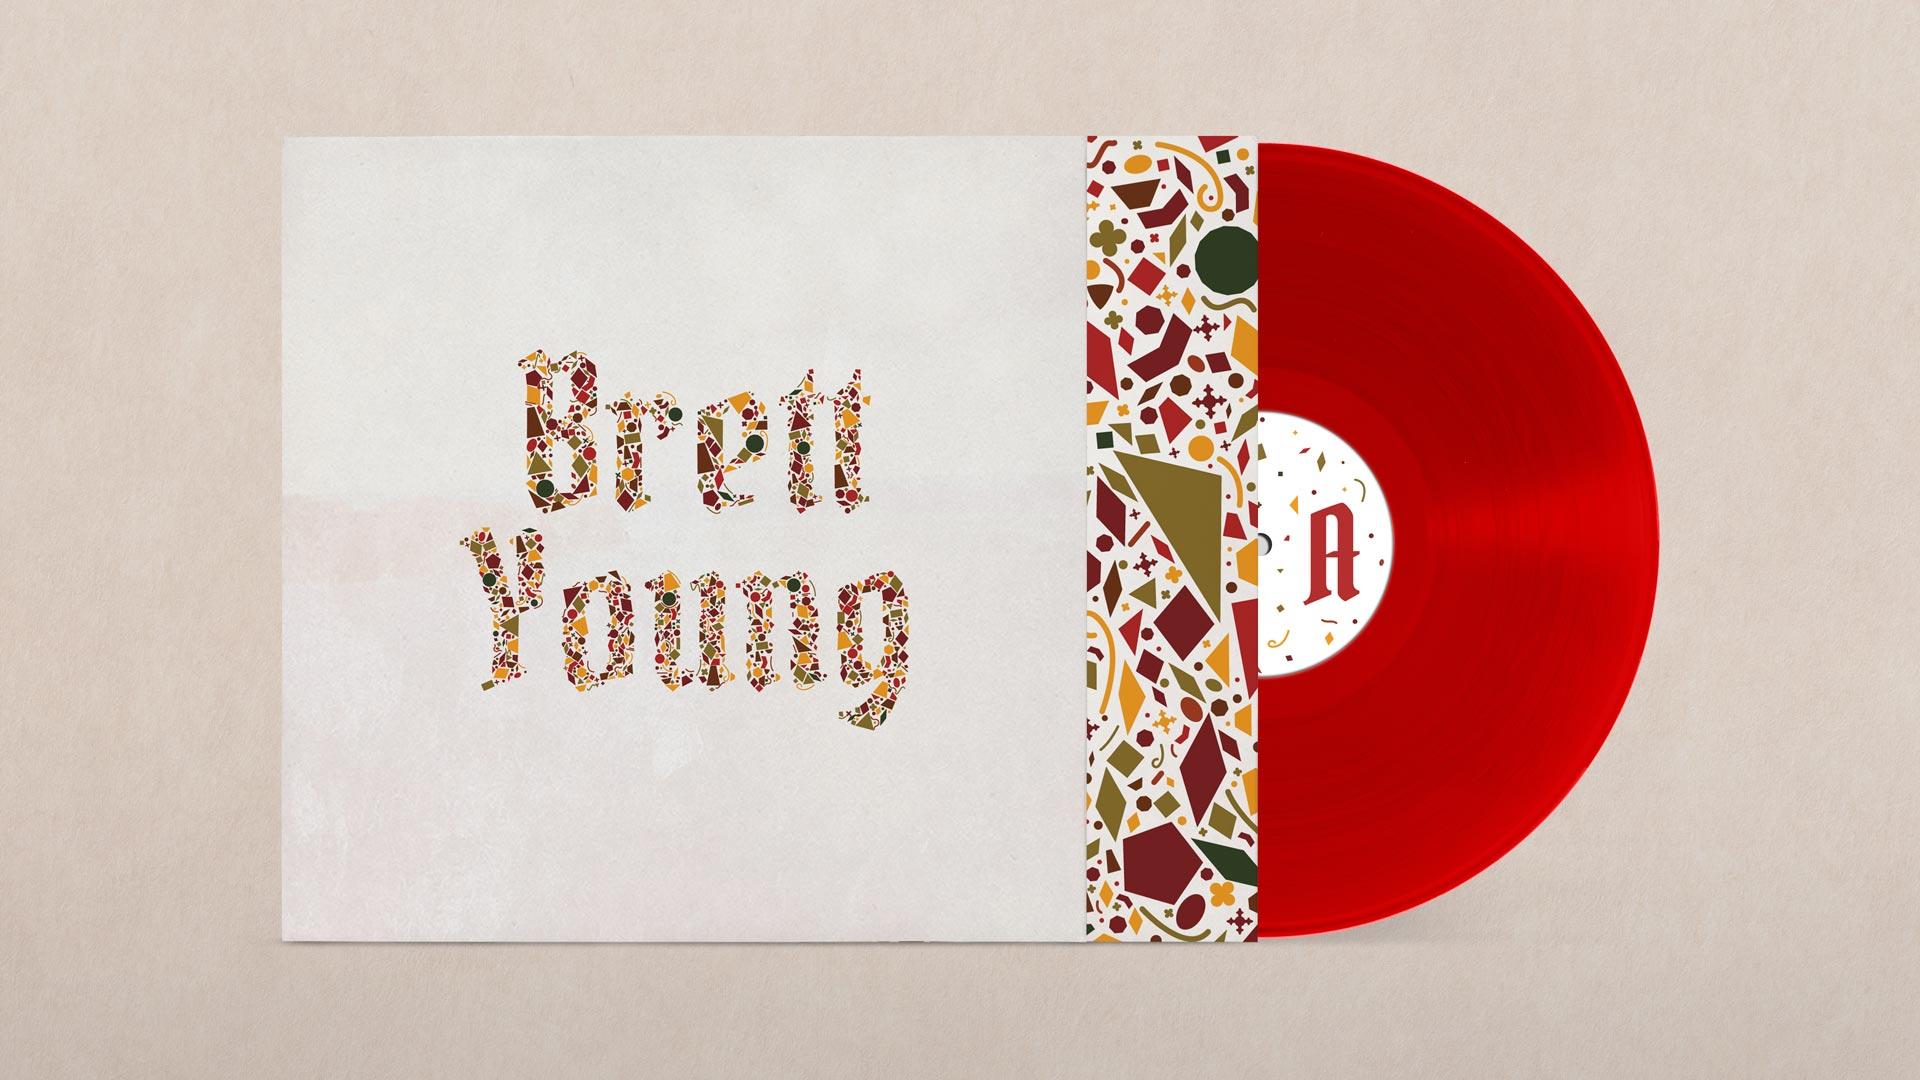 Brett Young album packaging